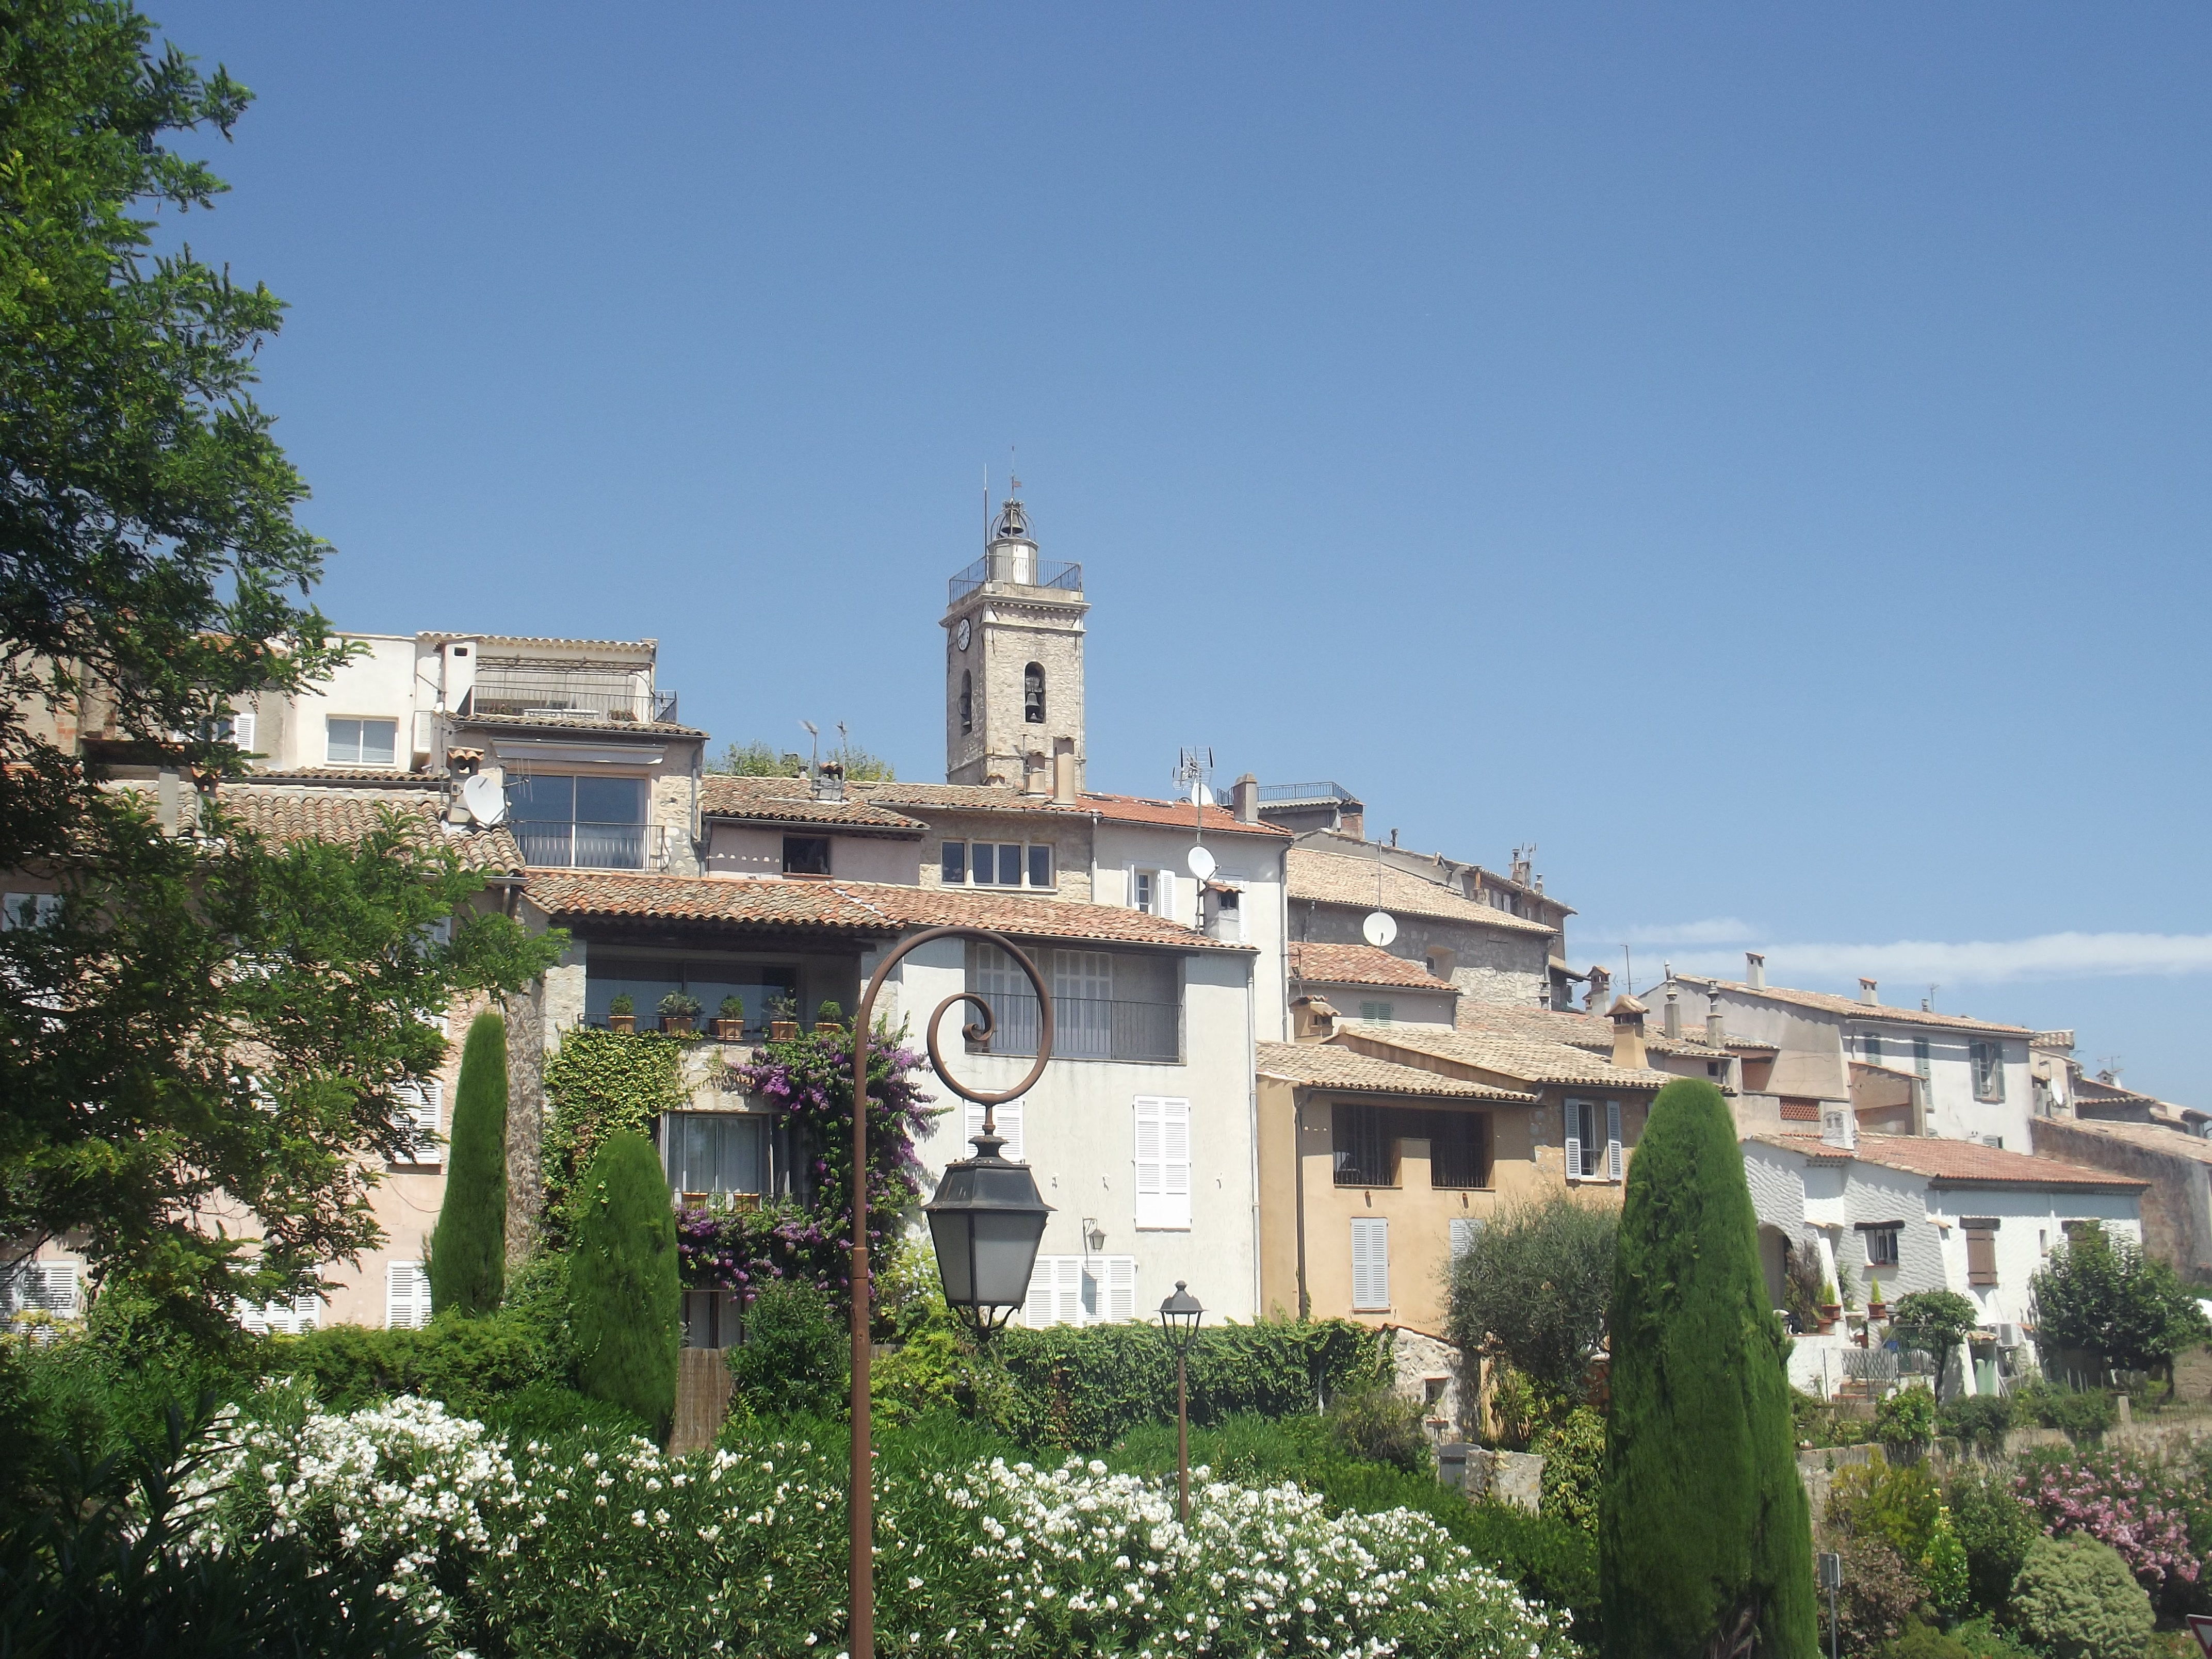 File:Mougins village (06).JPG - Wikimedia Commons